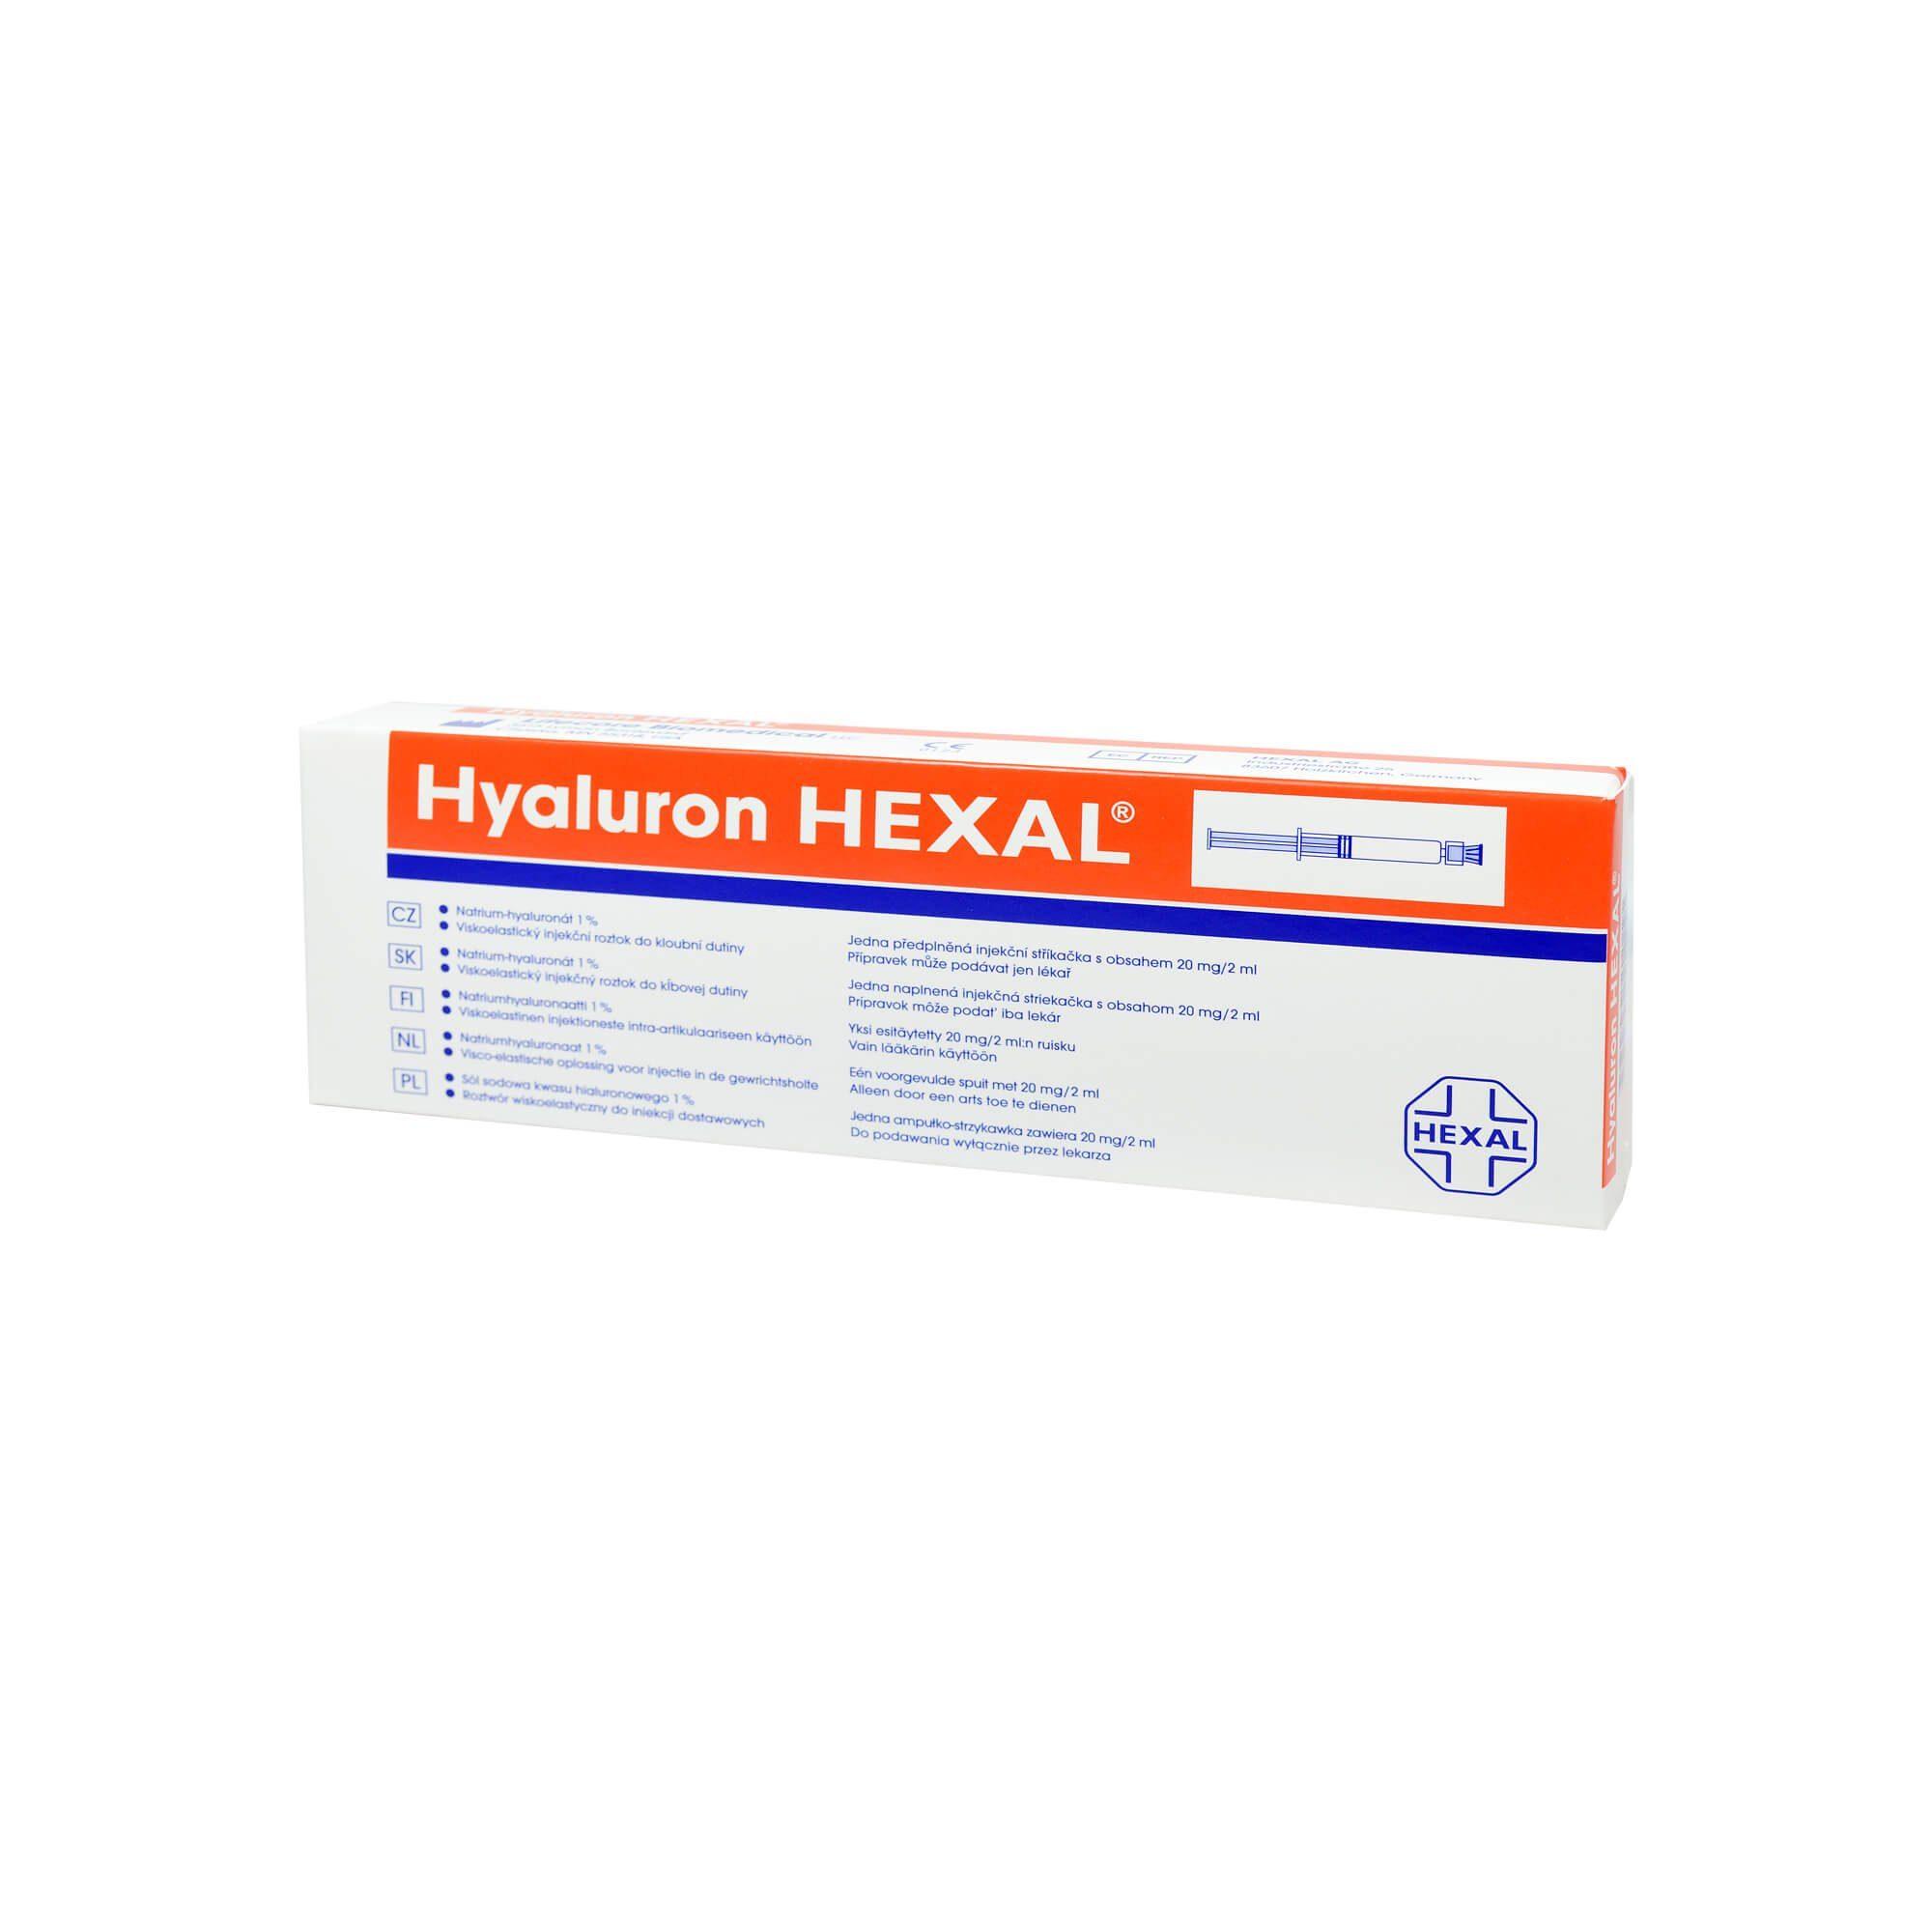 Hyaluron Hexal Fertigspritzen , 1 St